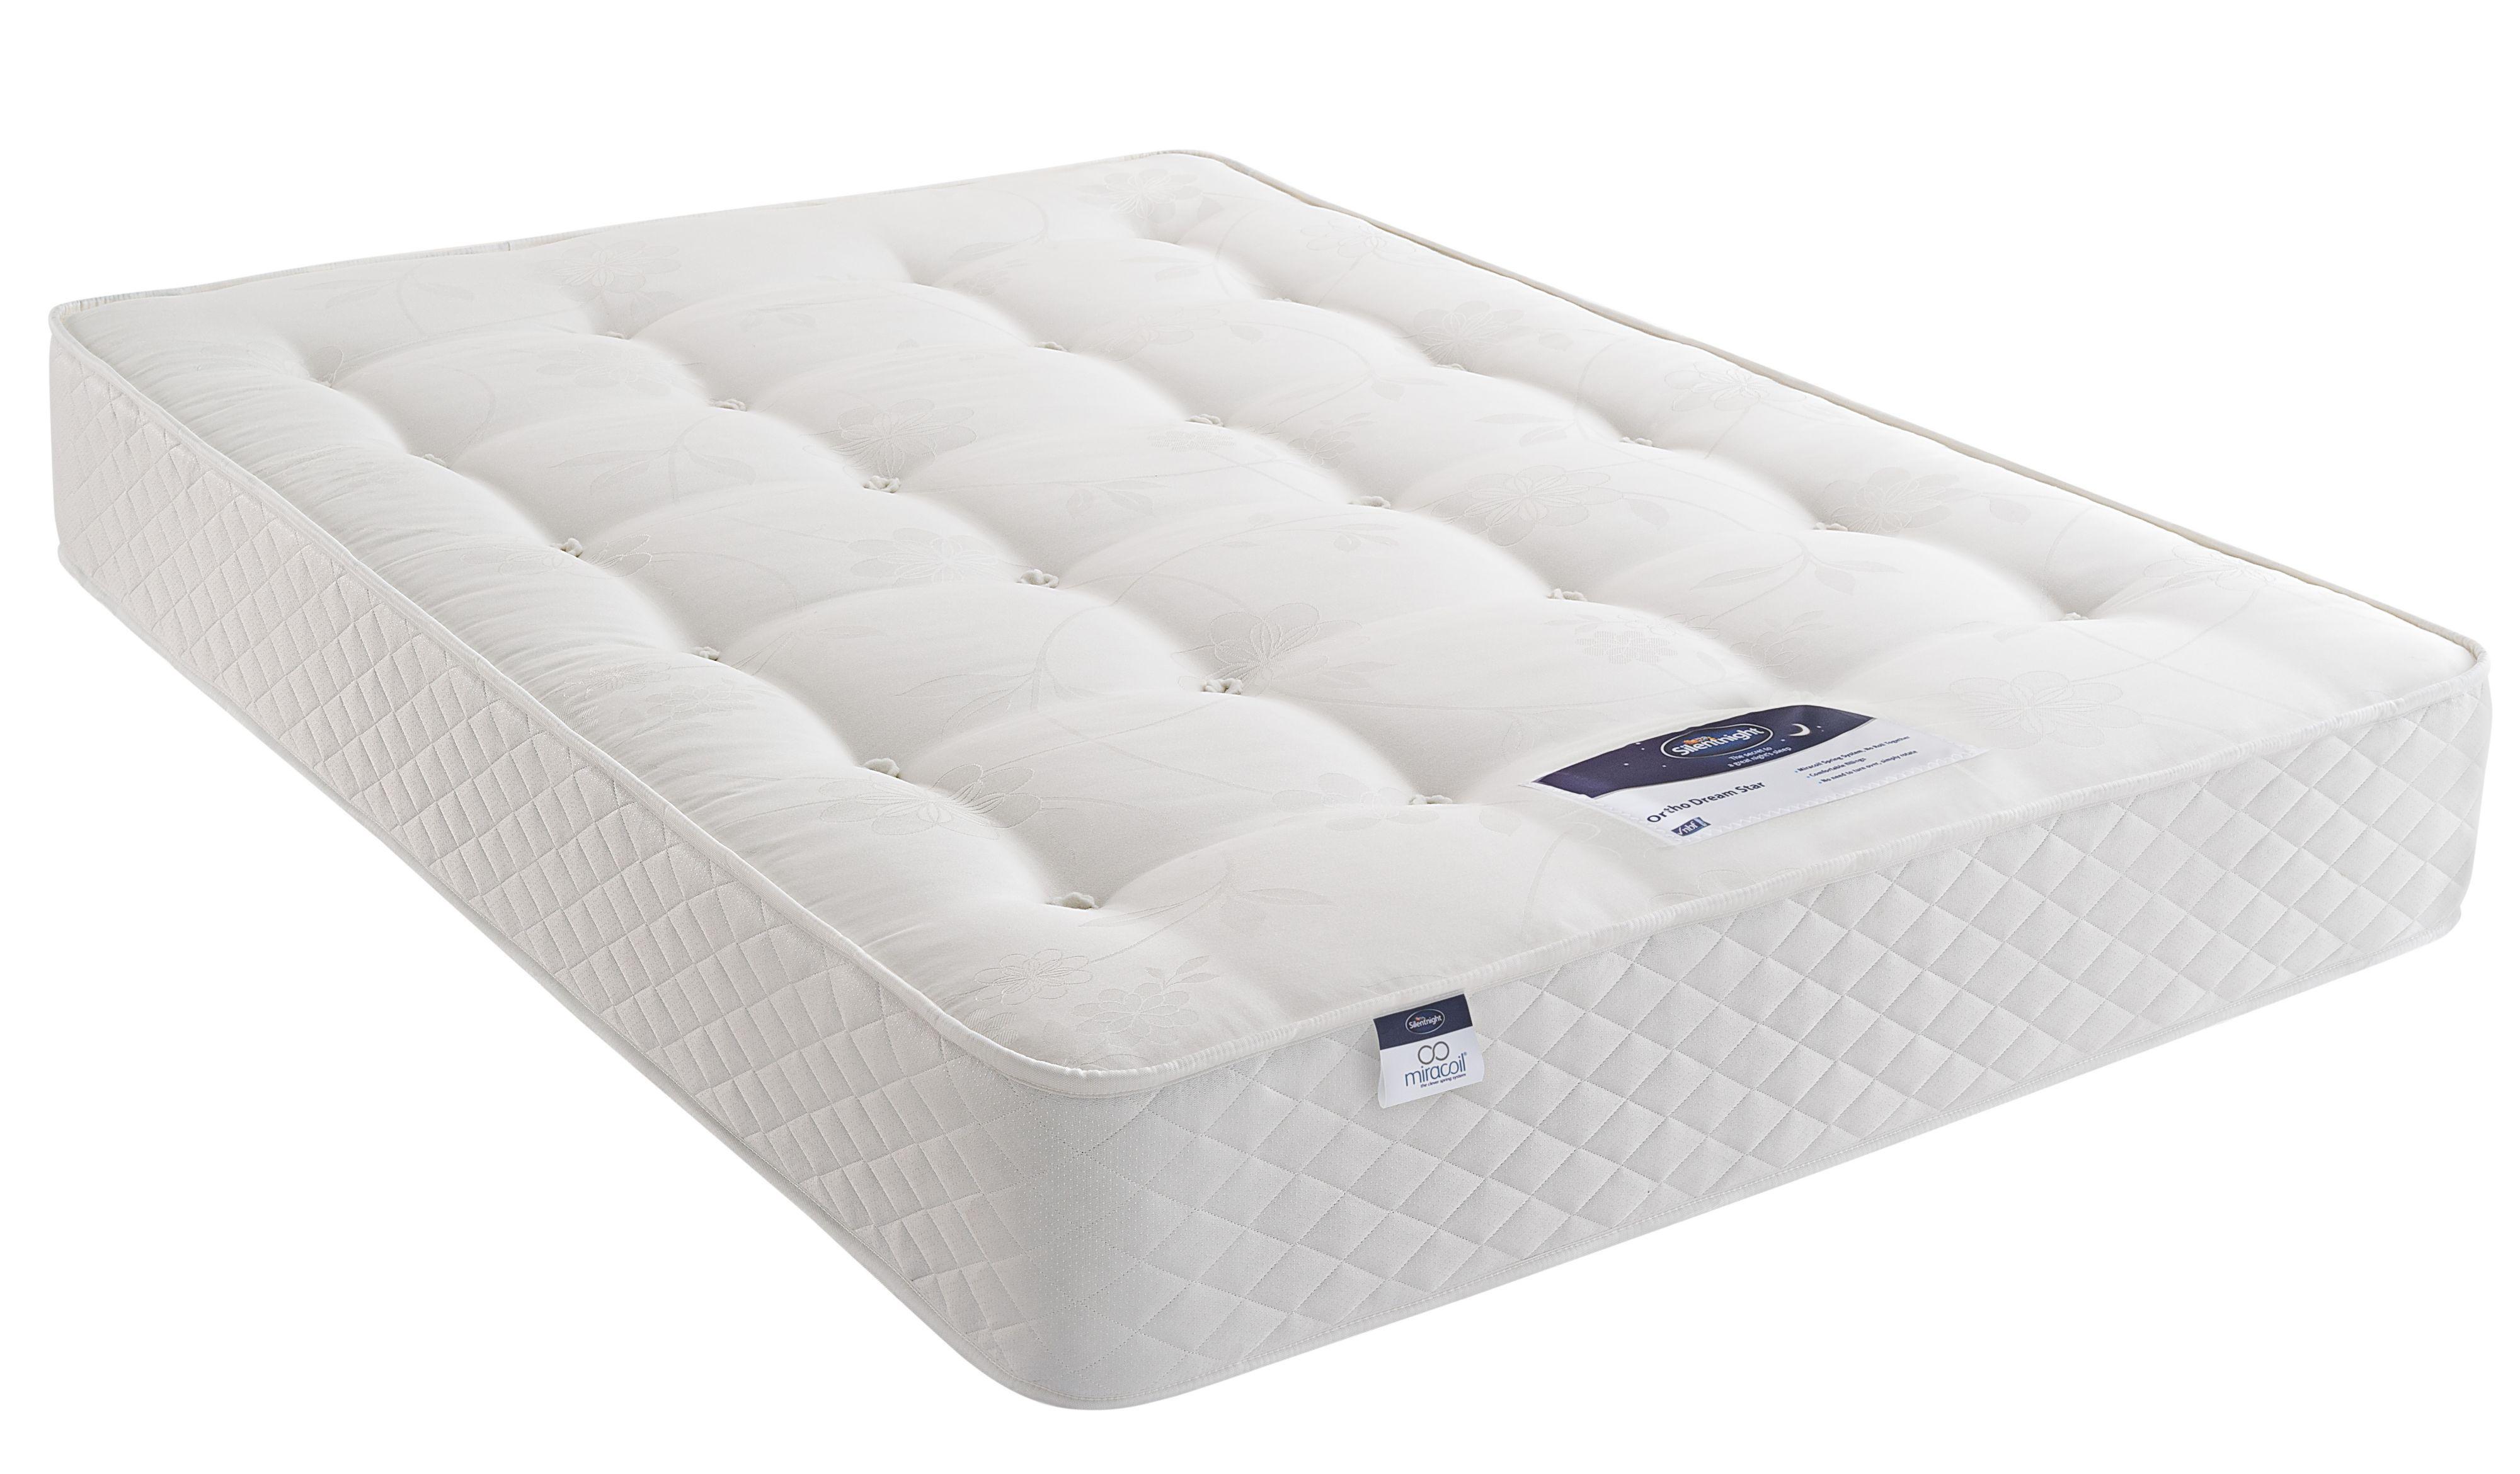 silentnight miracoil king size mattress departments. Black Bedroom Furniture Sets. Home Design Ideas